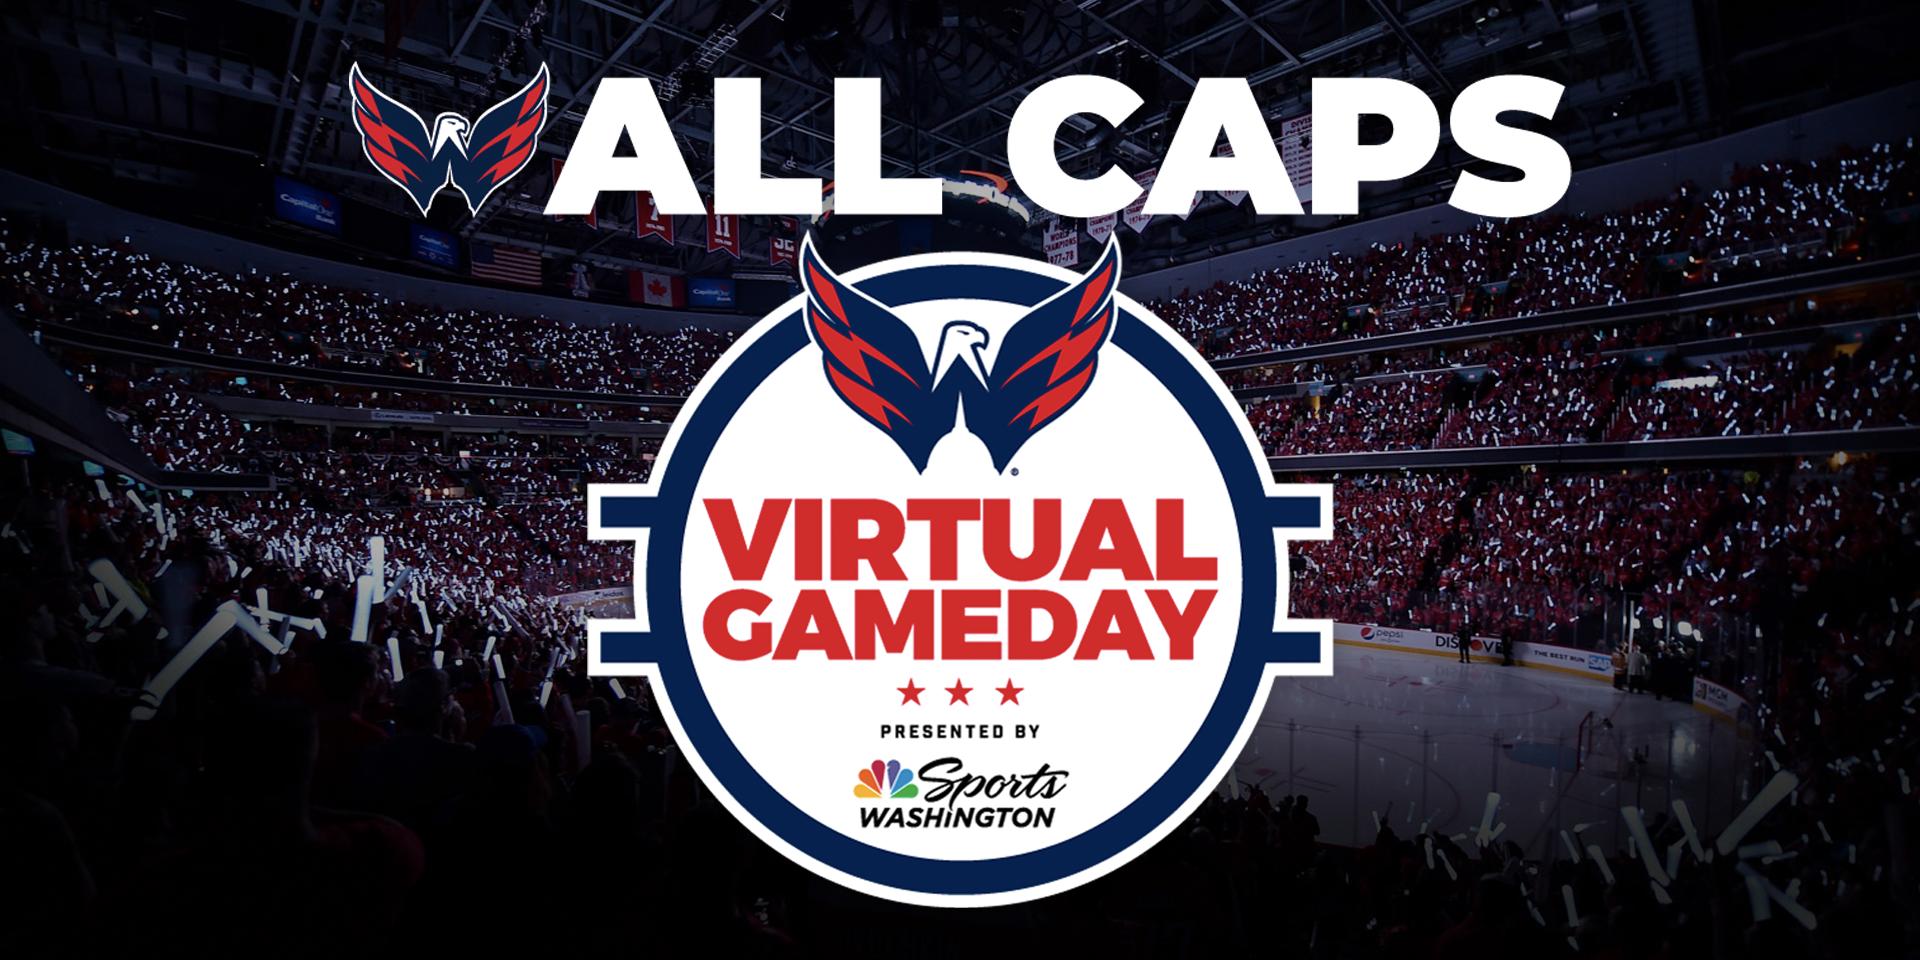 Washington Capitals Virtual Gameday header